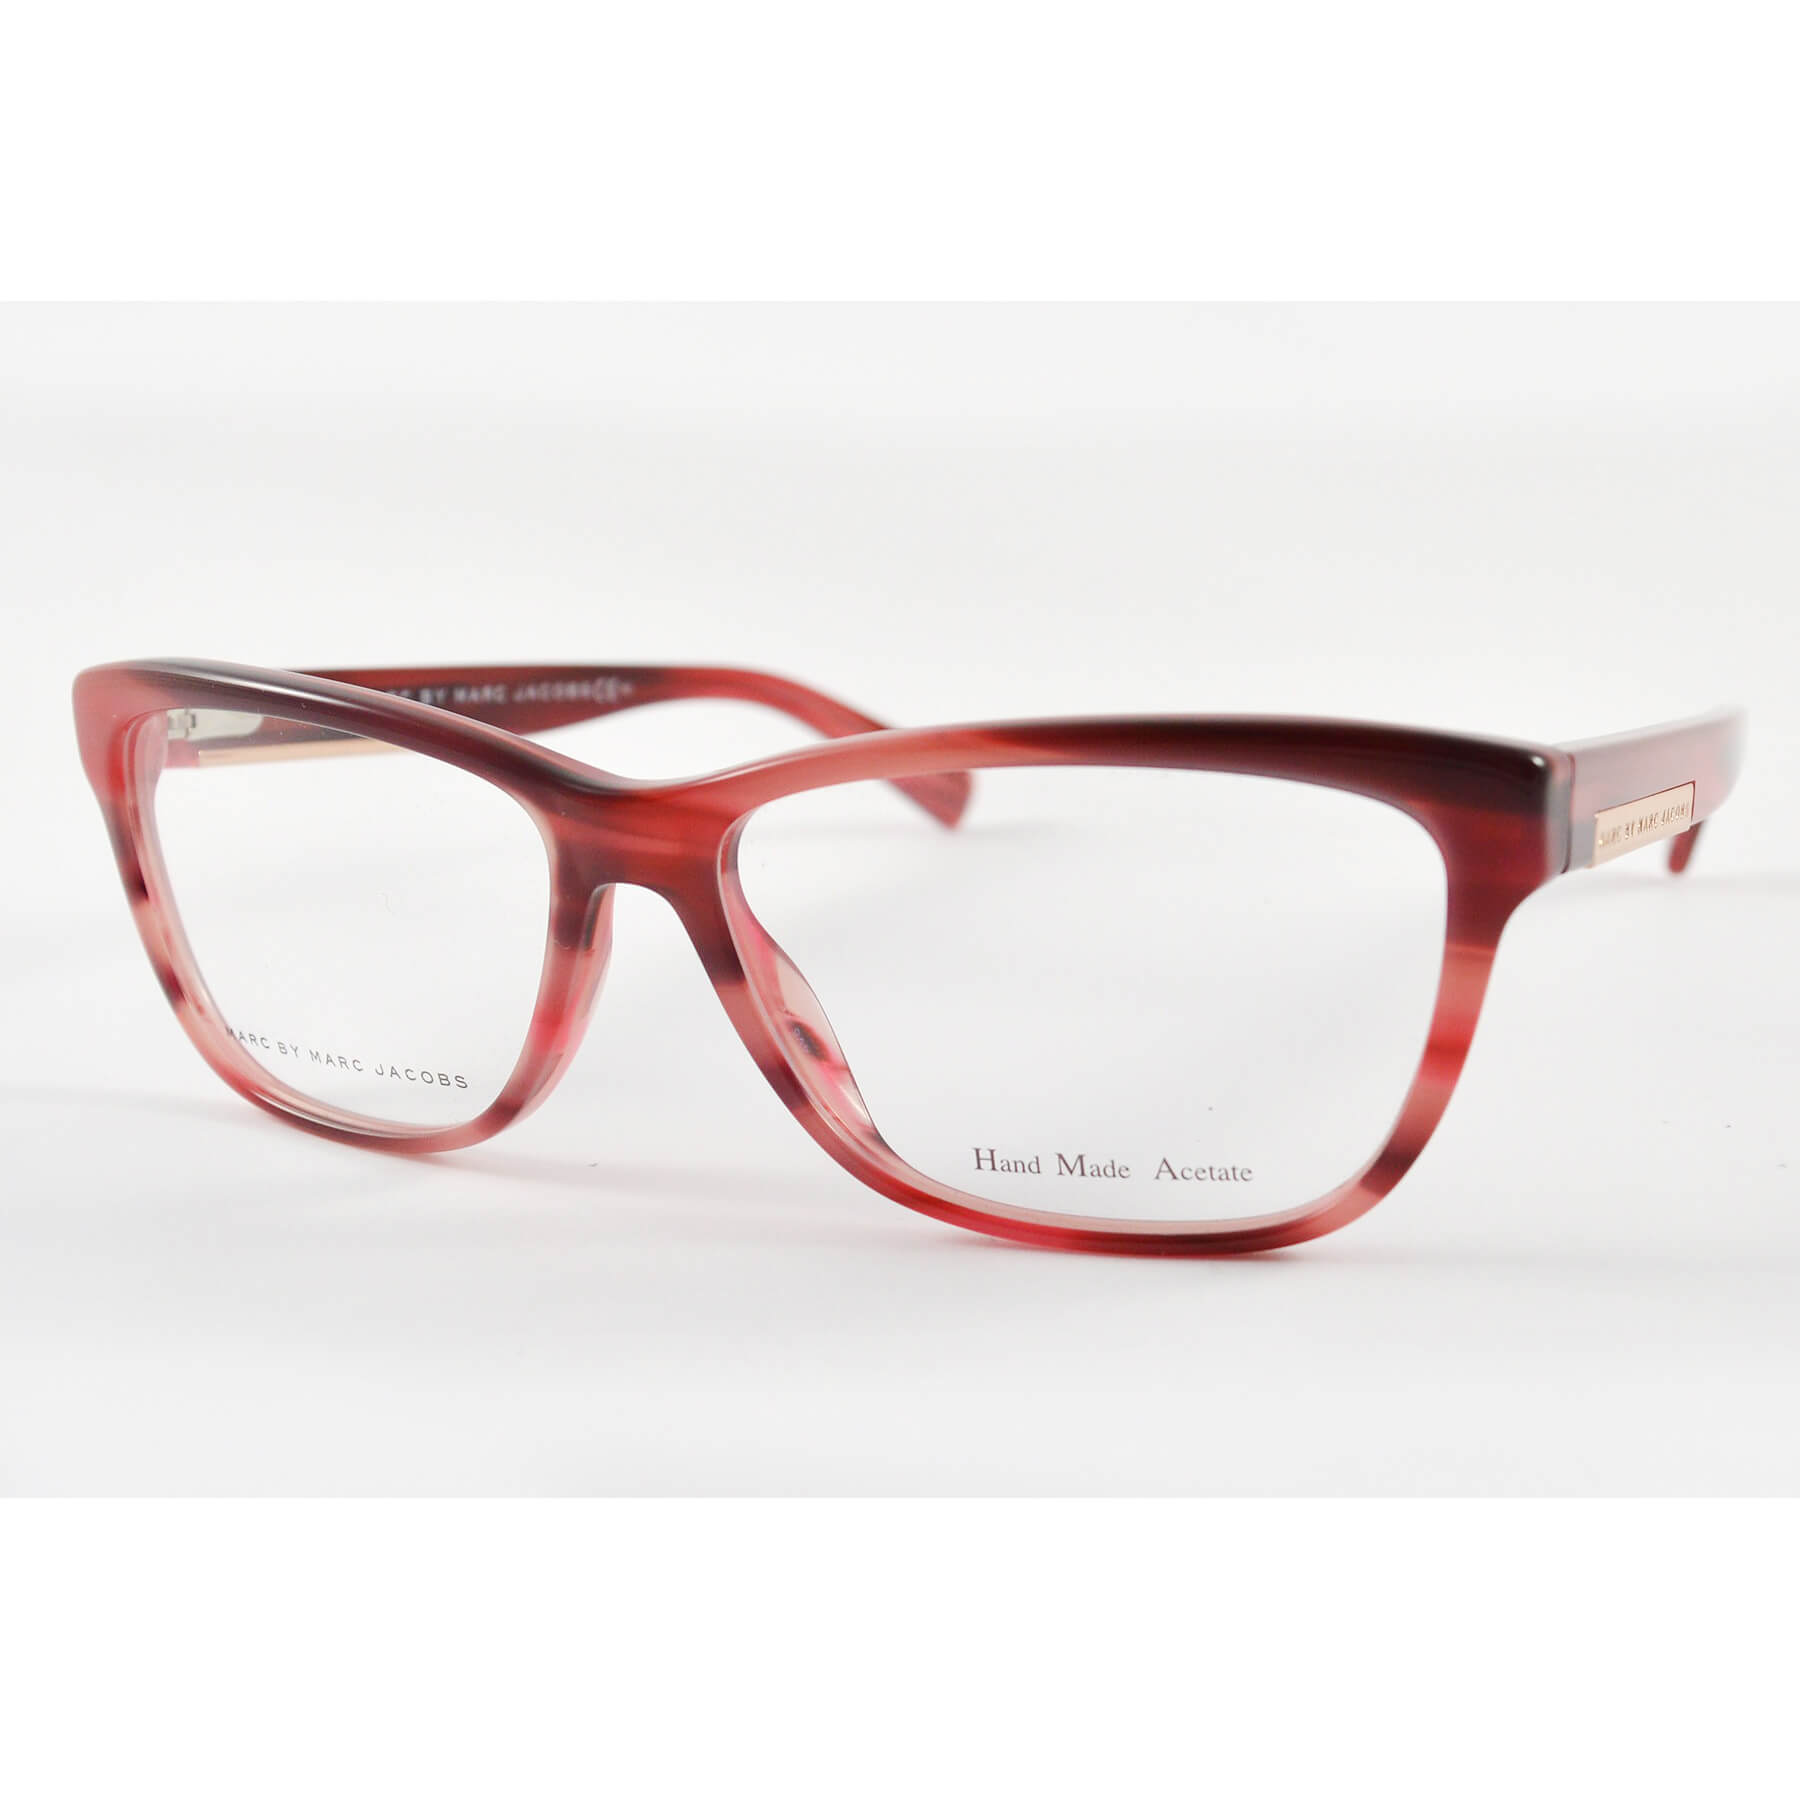 fa268037512 Marc by Marc Jacobs 618 KVN Burgundy Striped Eyeglasses